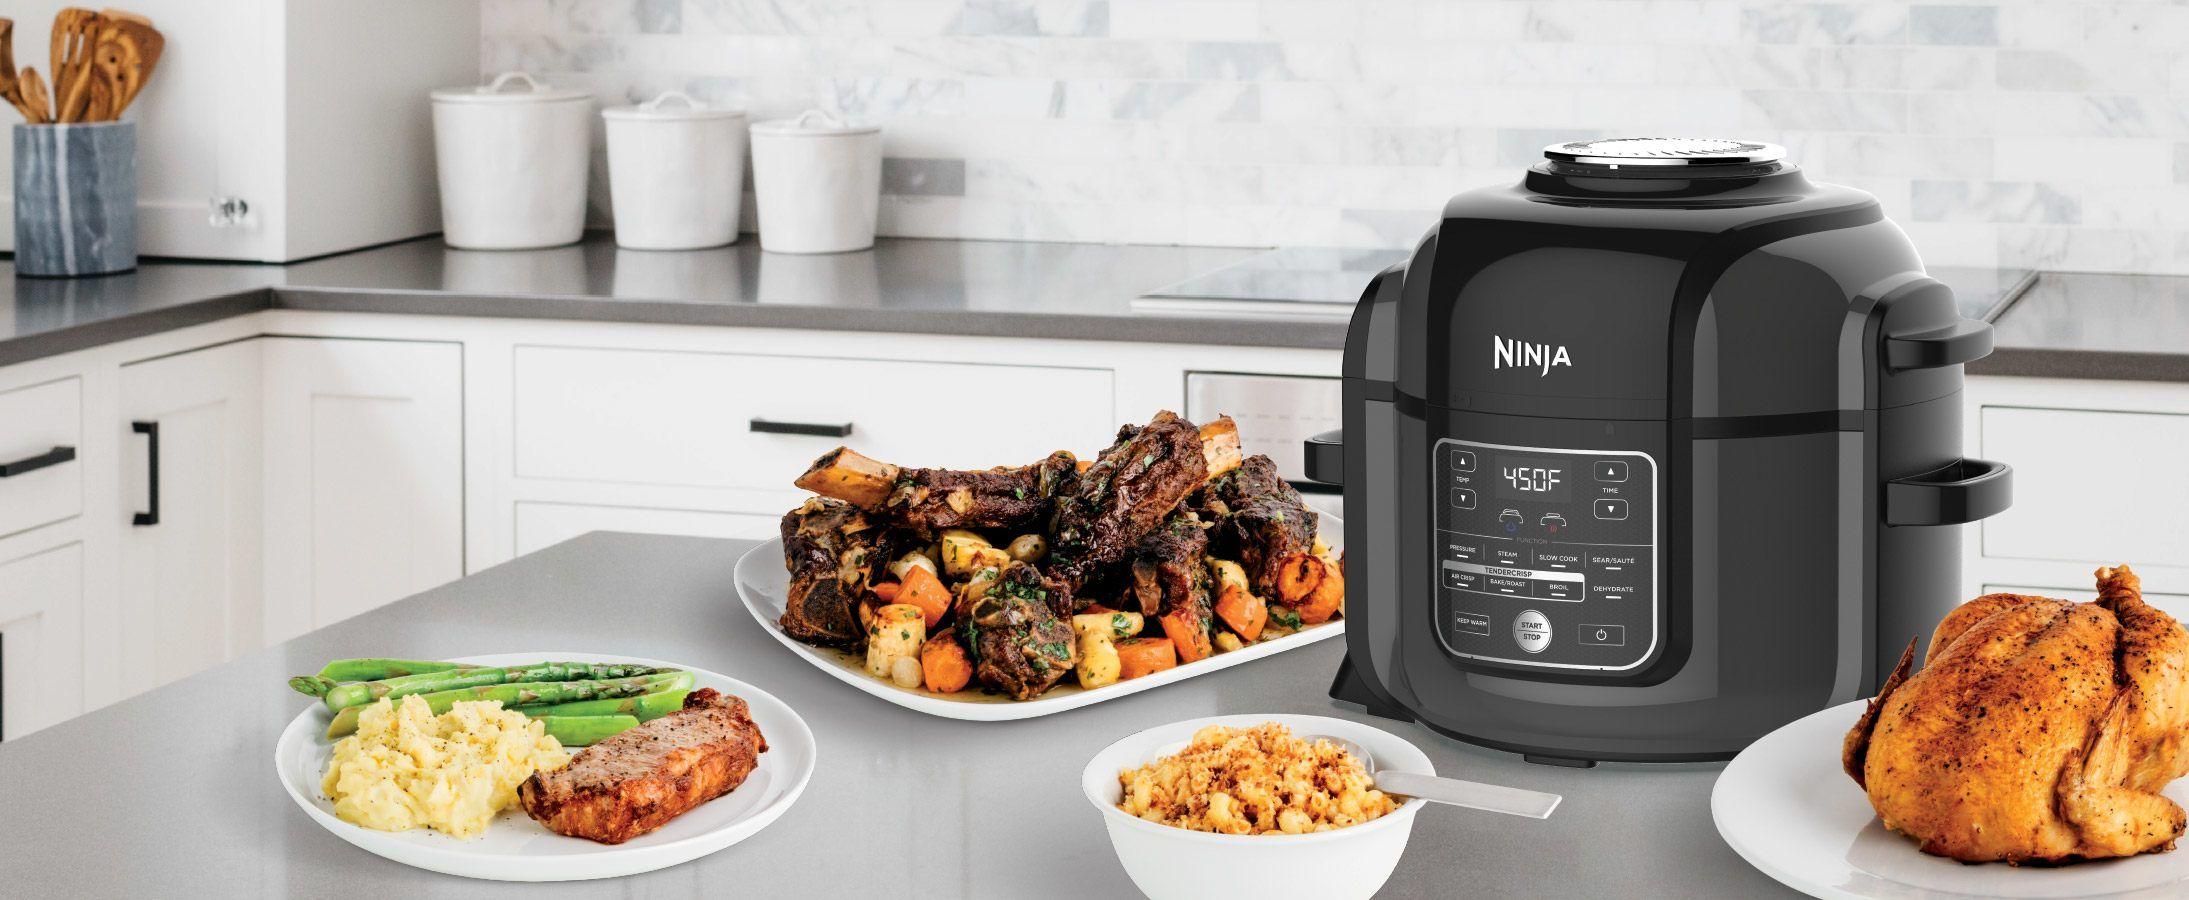 Teriyaki Chicken, Broccoli & Rice Recipe in 2019 | Ninja ...